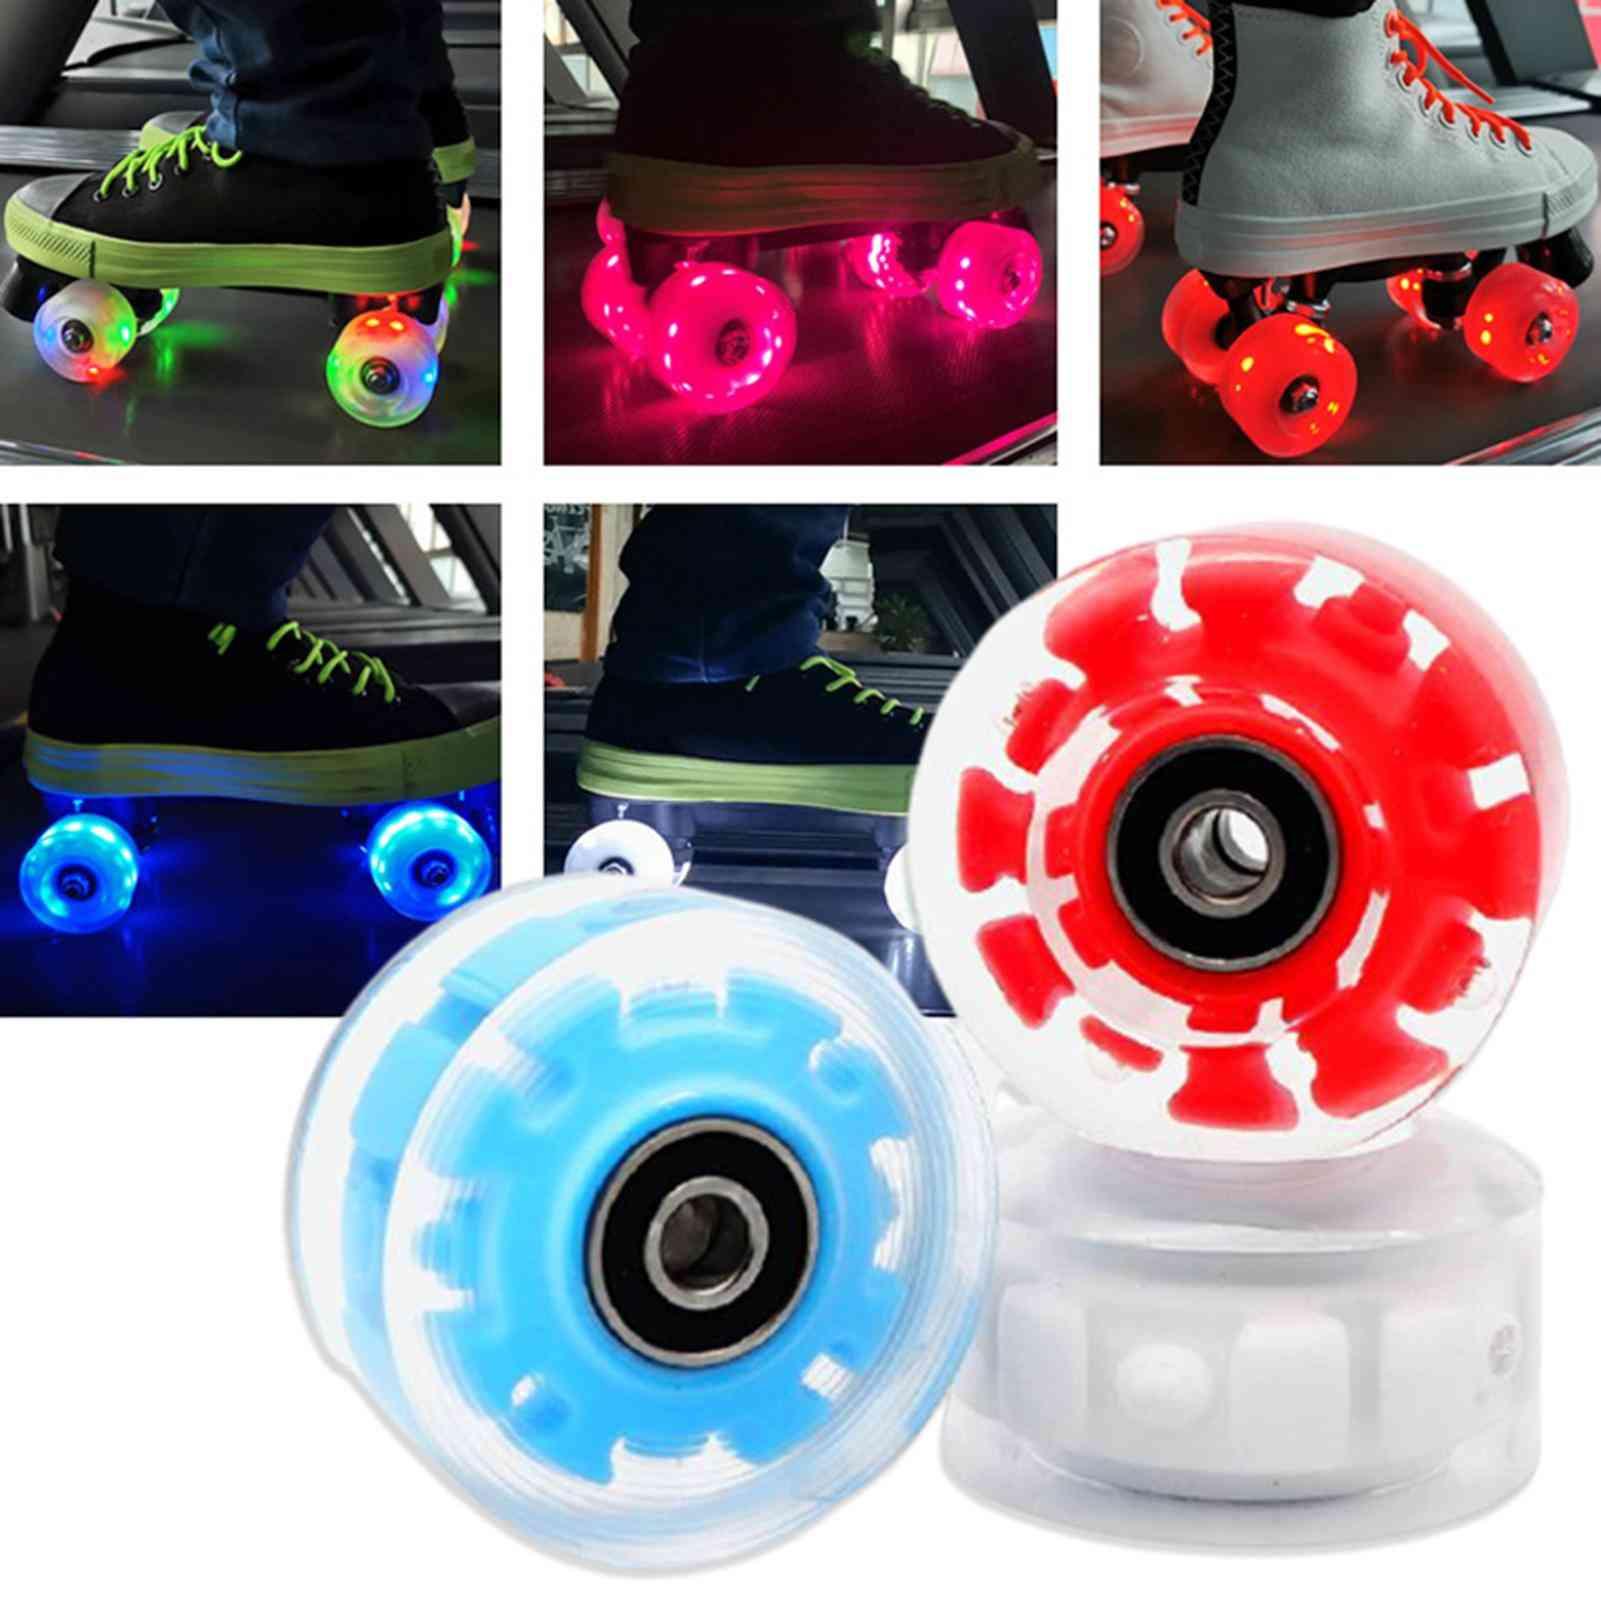 Wear-resistant Roller, Sliding, Skating, Skate Wheels Replacements